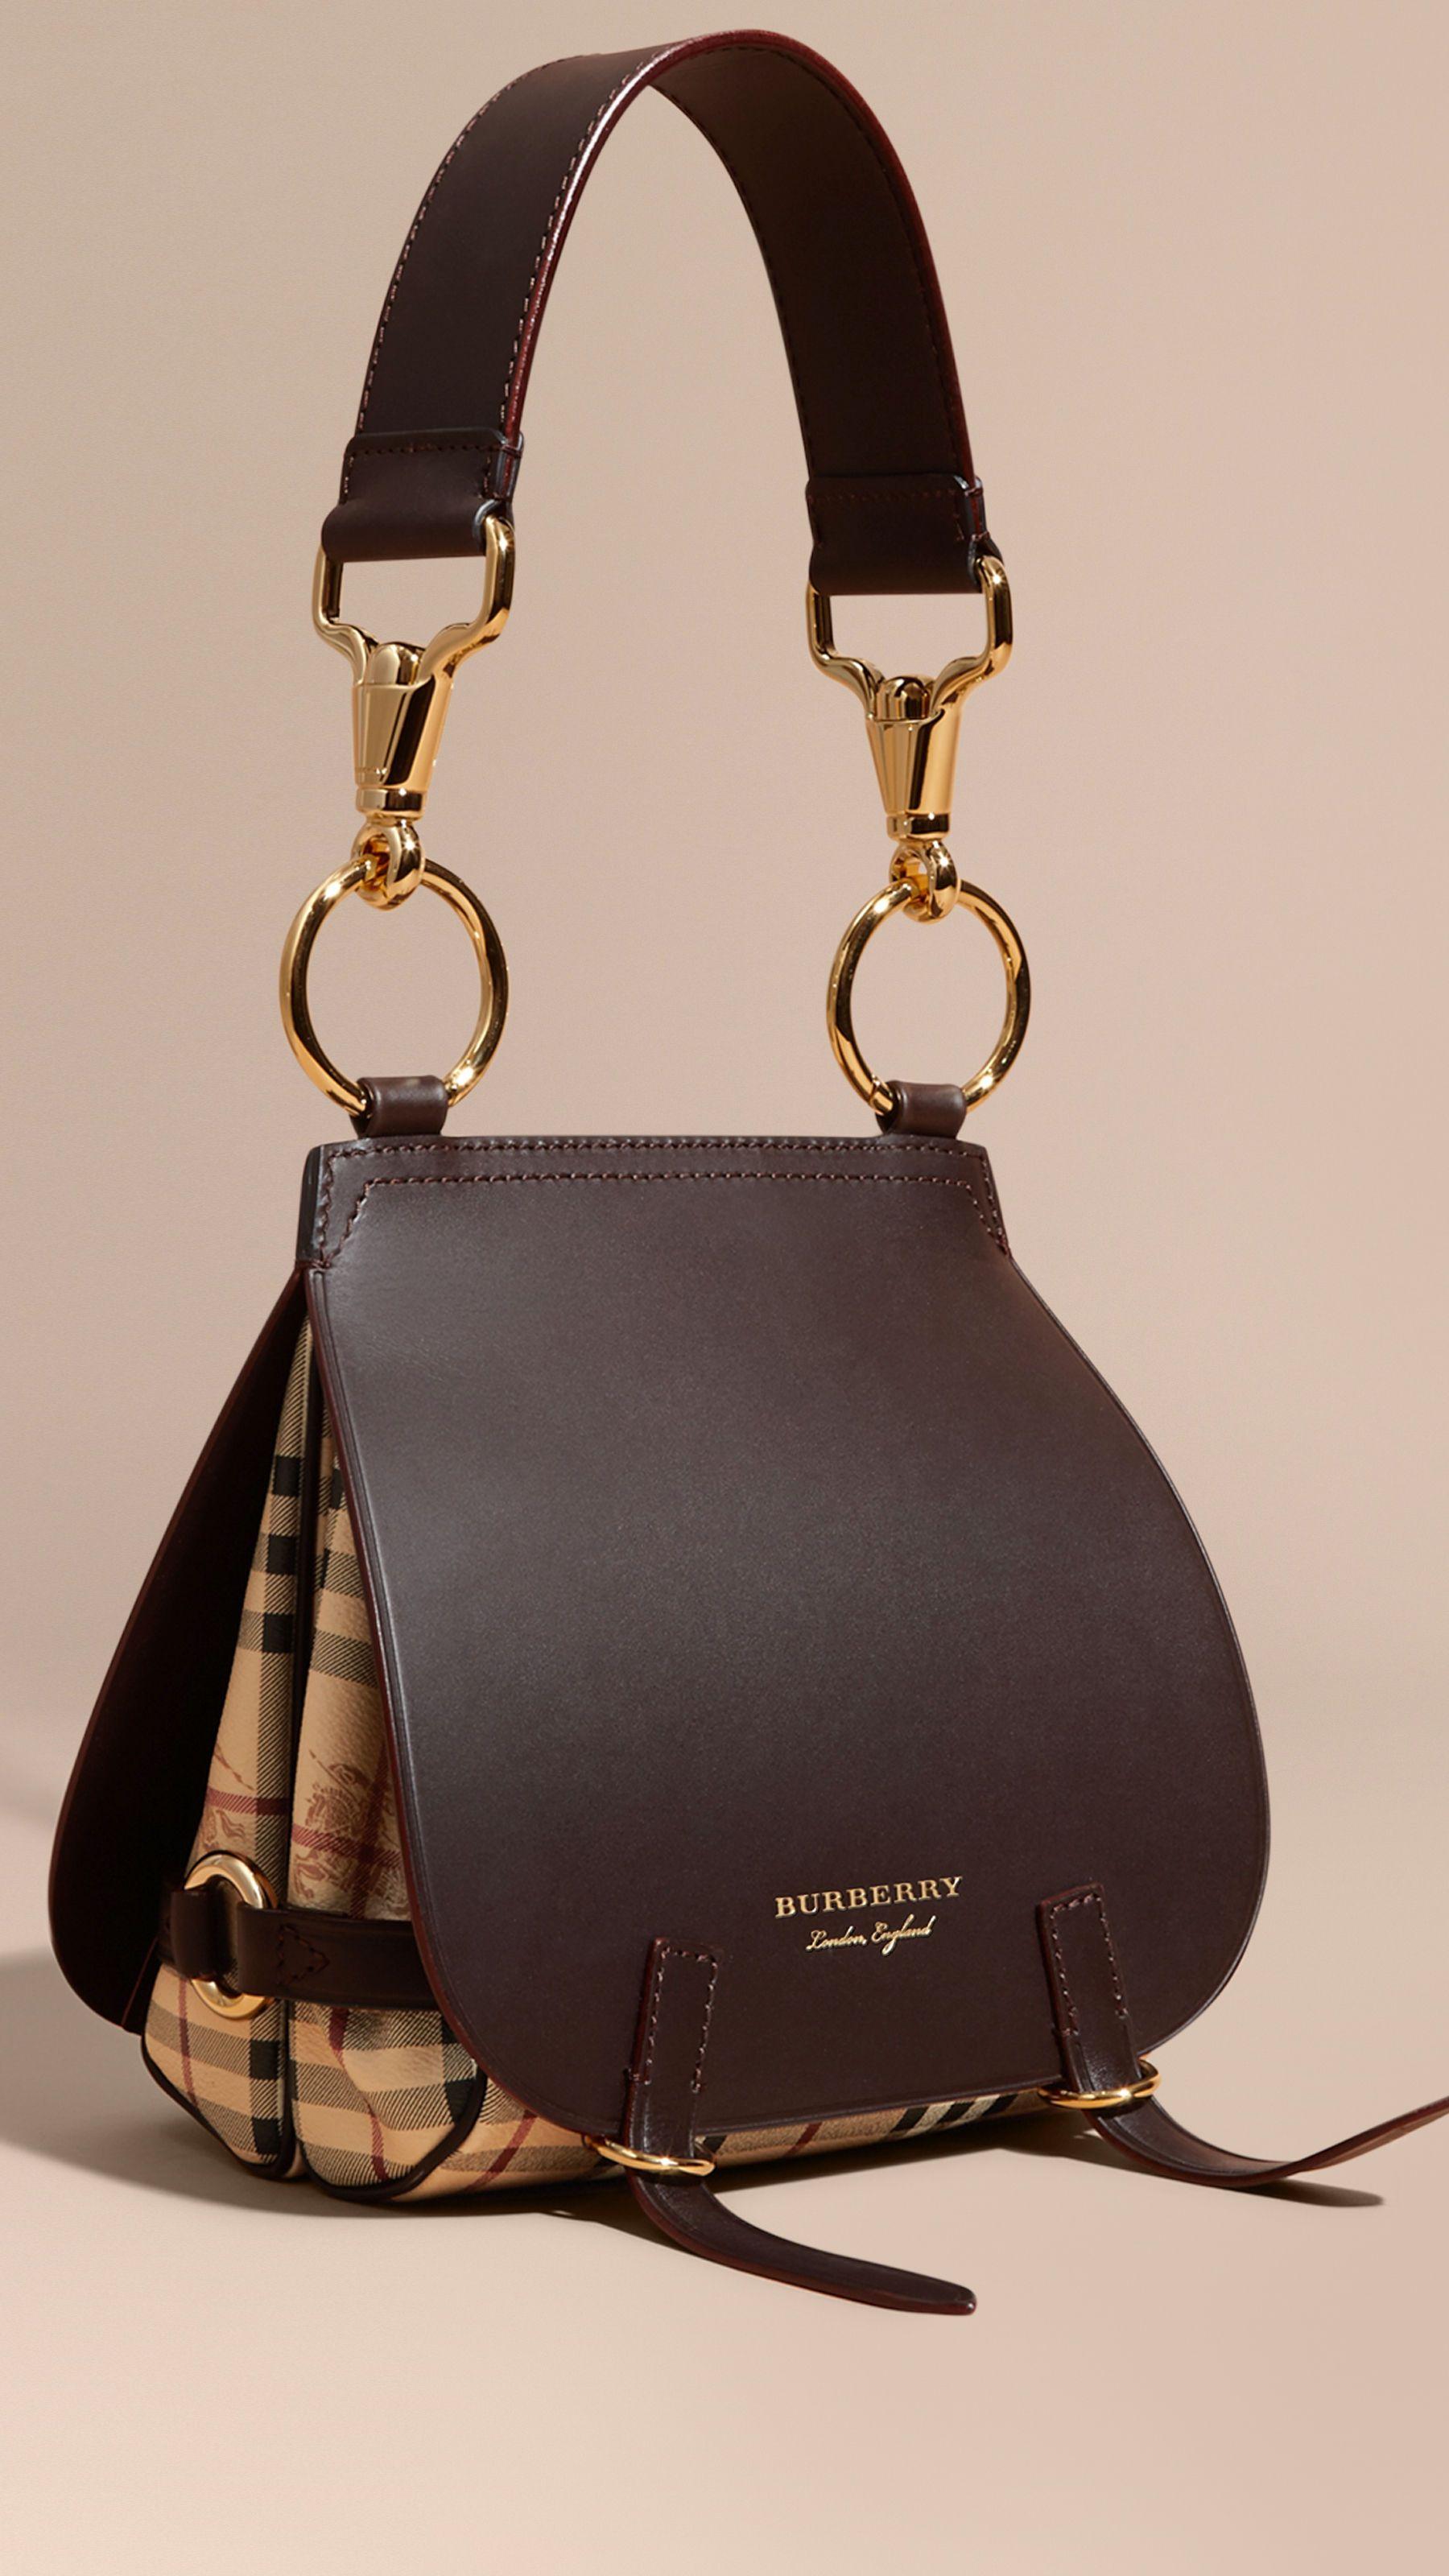 Burberry Tasche Zaumzeug Leder